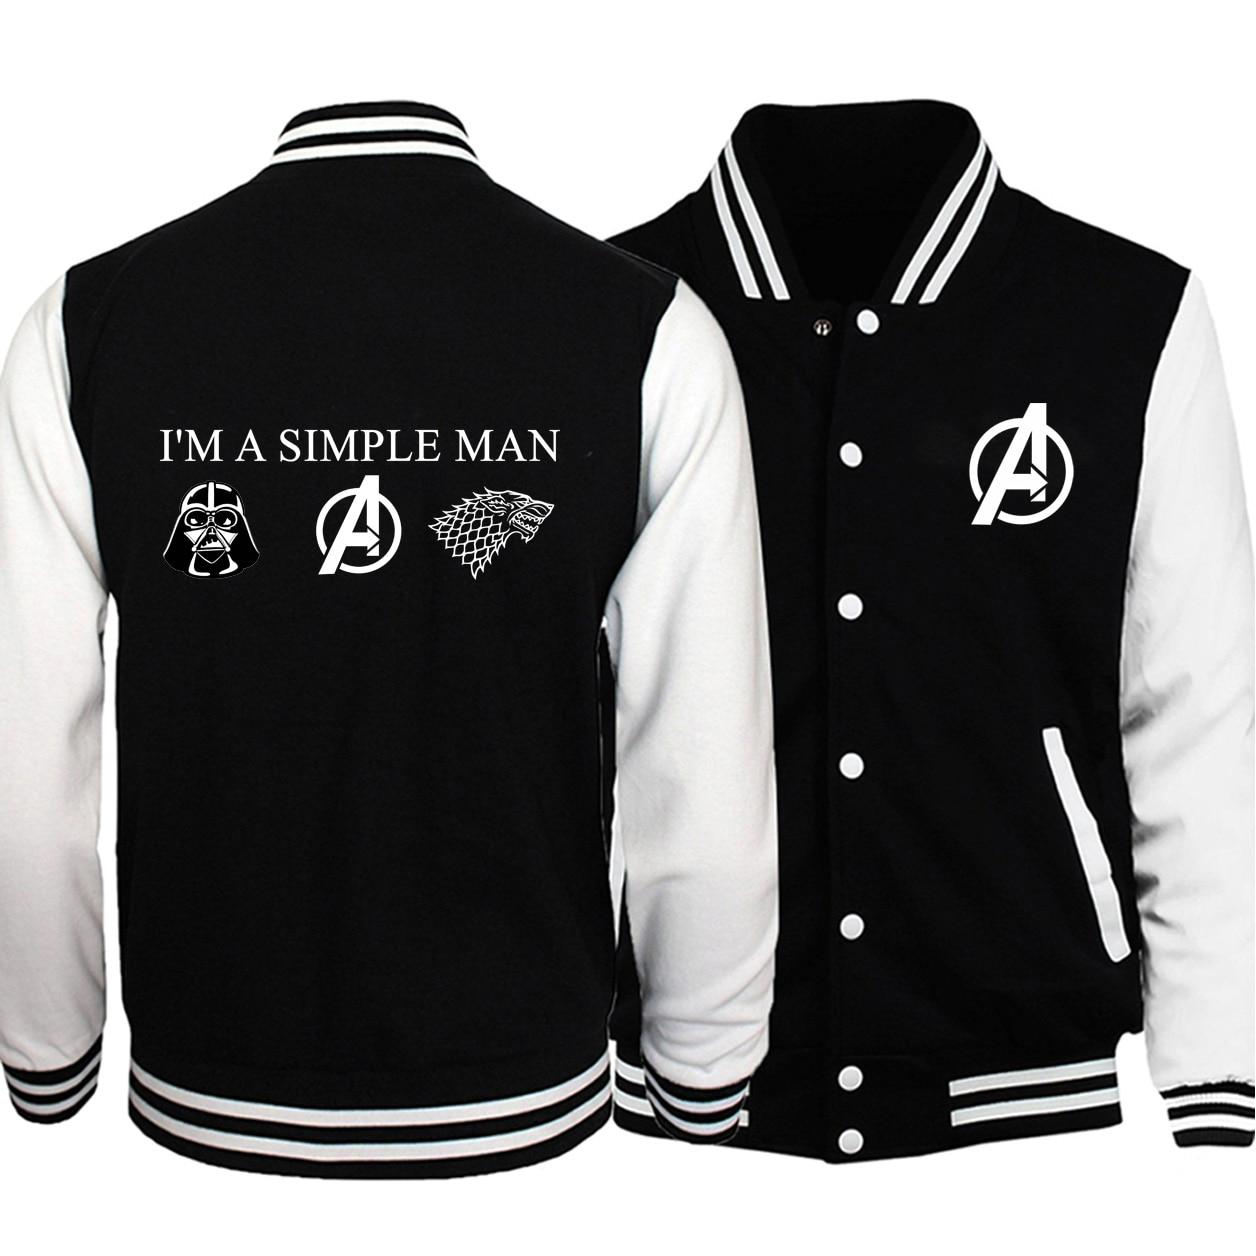 Men Avengers Game Of Thrones Print Baseball Jackets I'm A Simple Man Love Star Wars Pattern 2019 Winter Black Warm Fleece Jacket